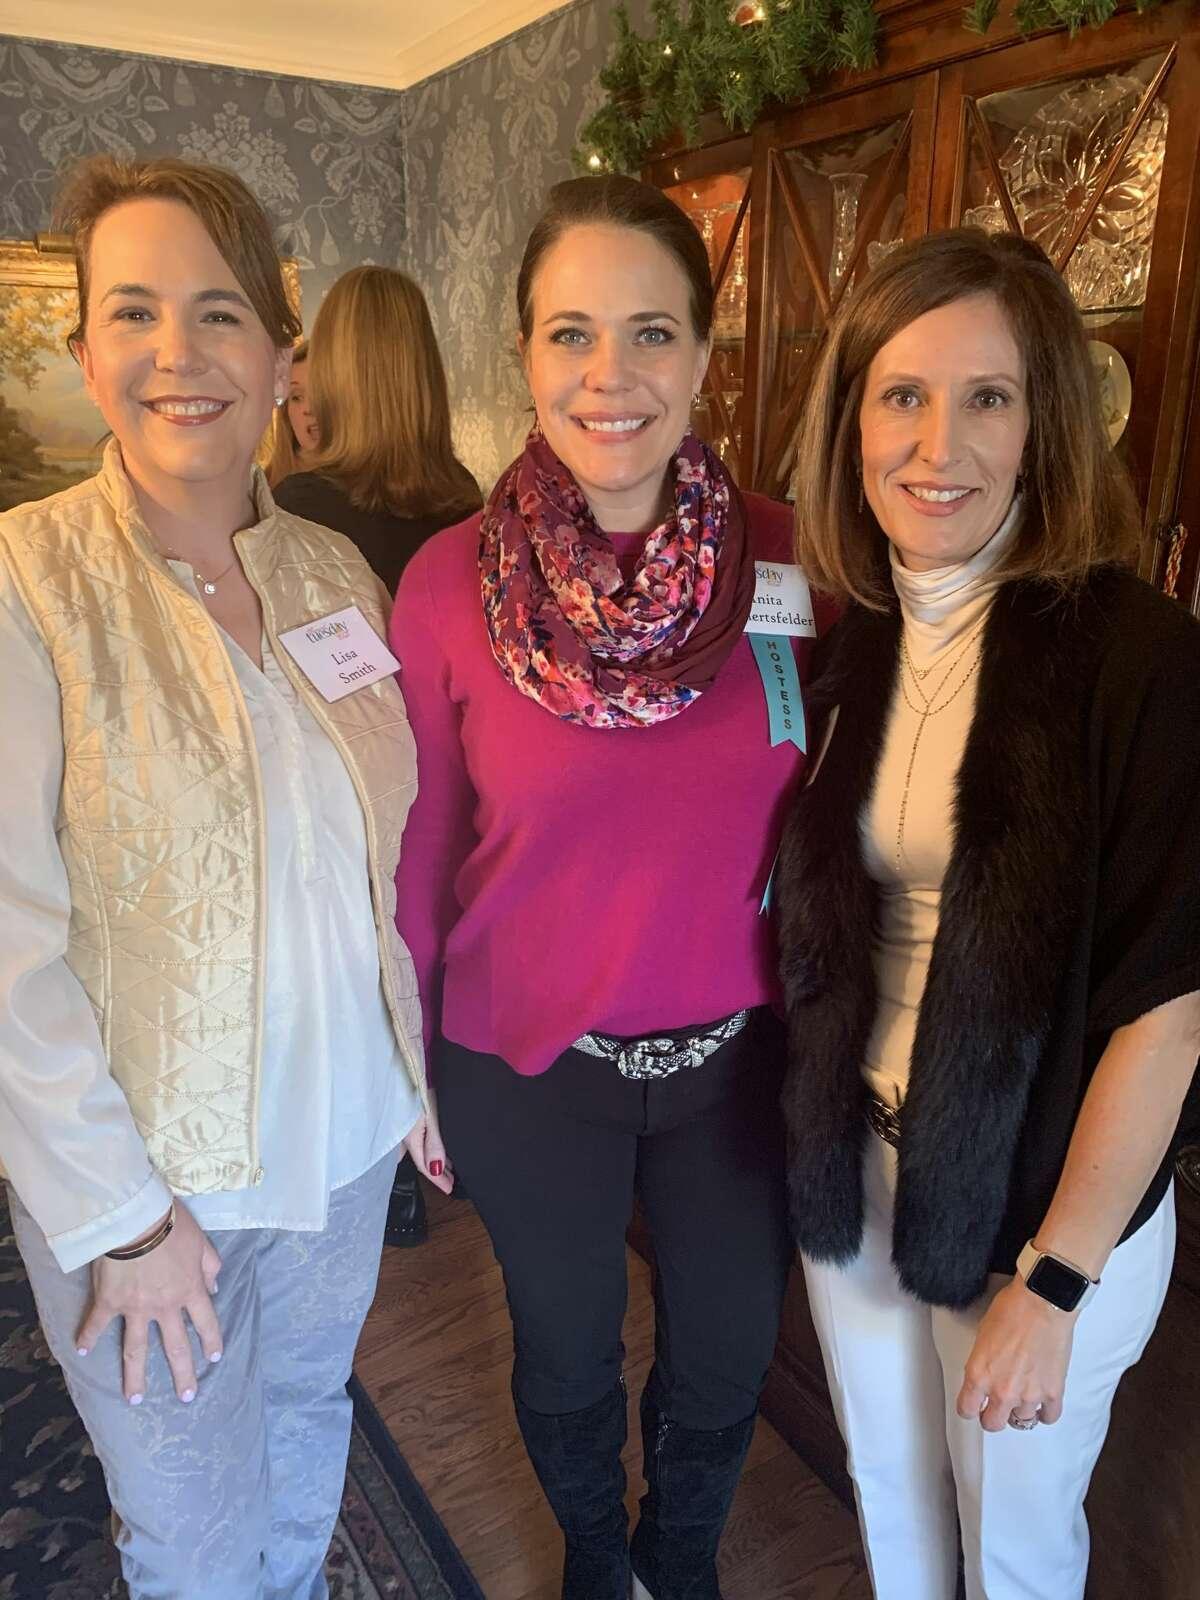 Junior League: Lisa Smith, from left, Anita Gamertsfelder and Apryl McDonald